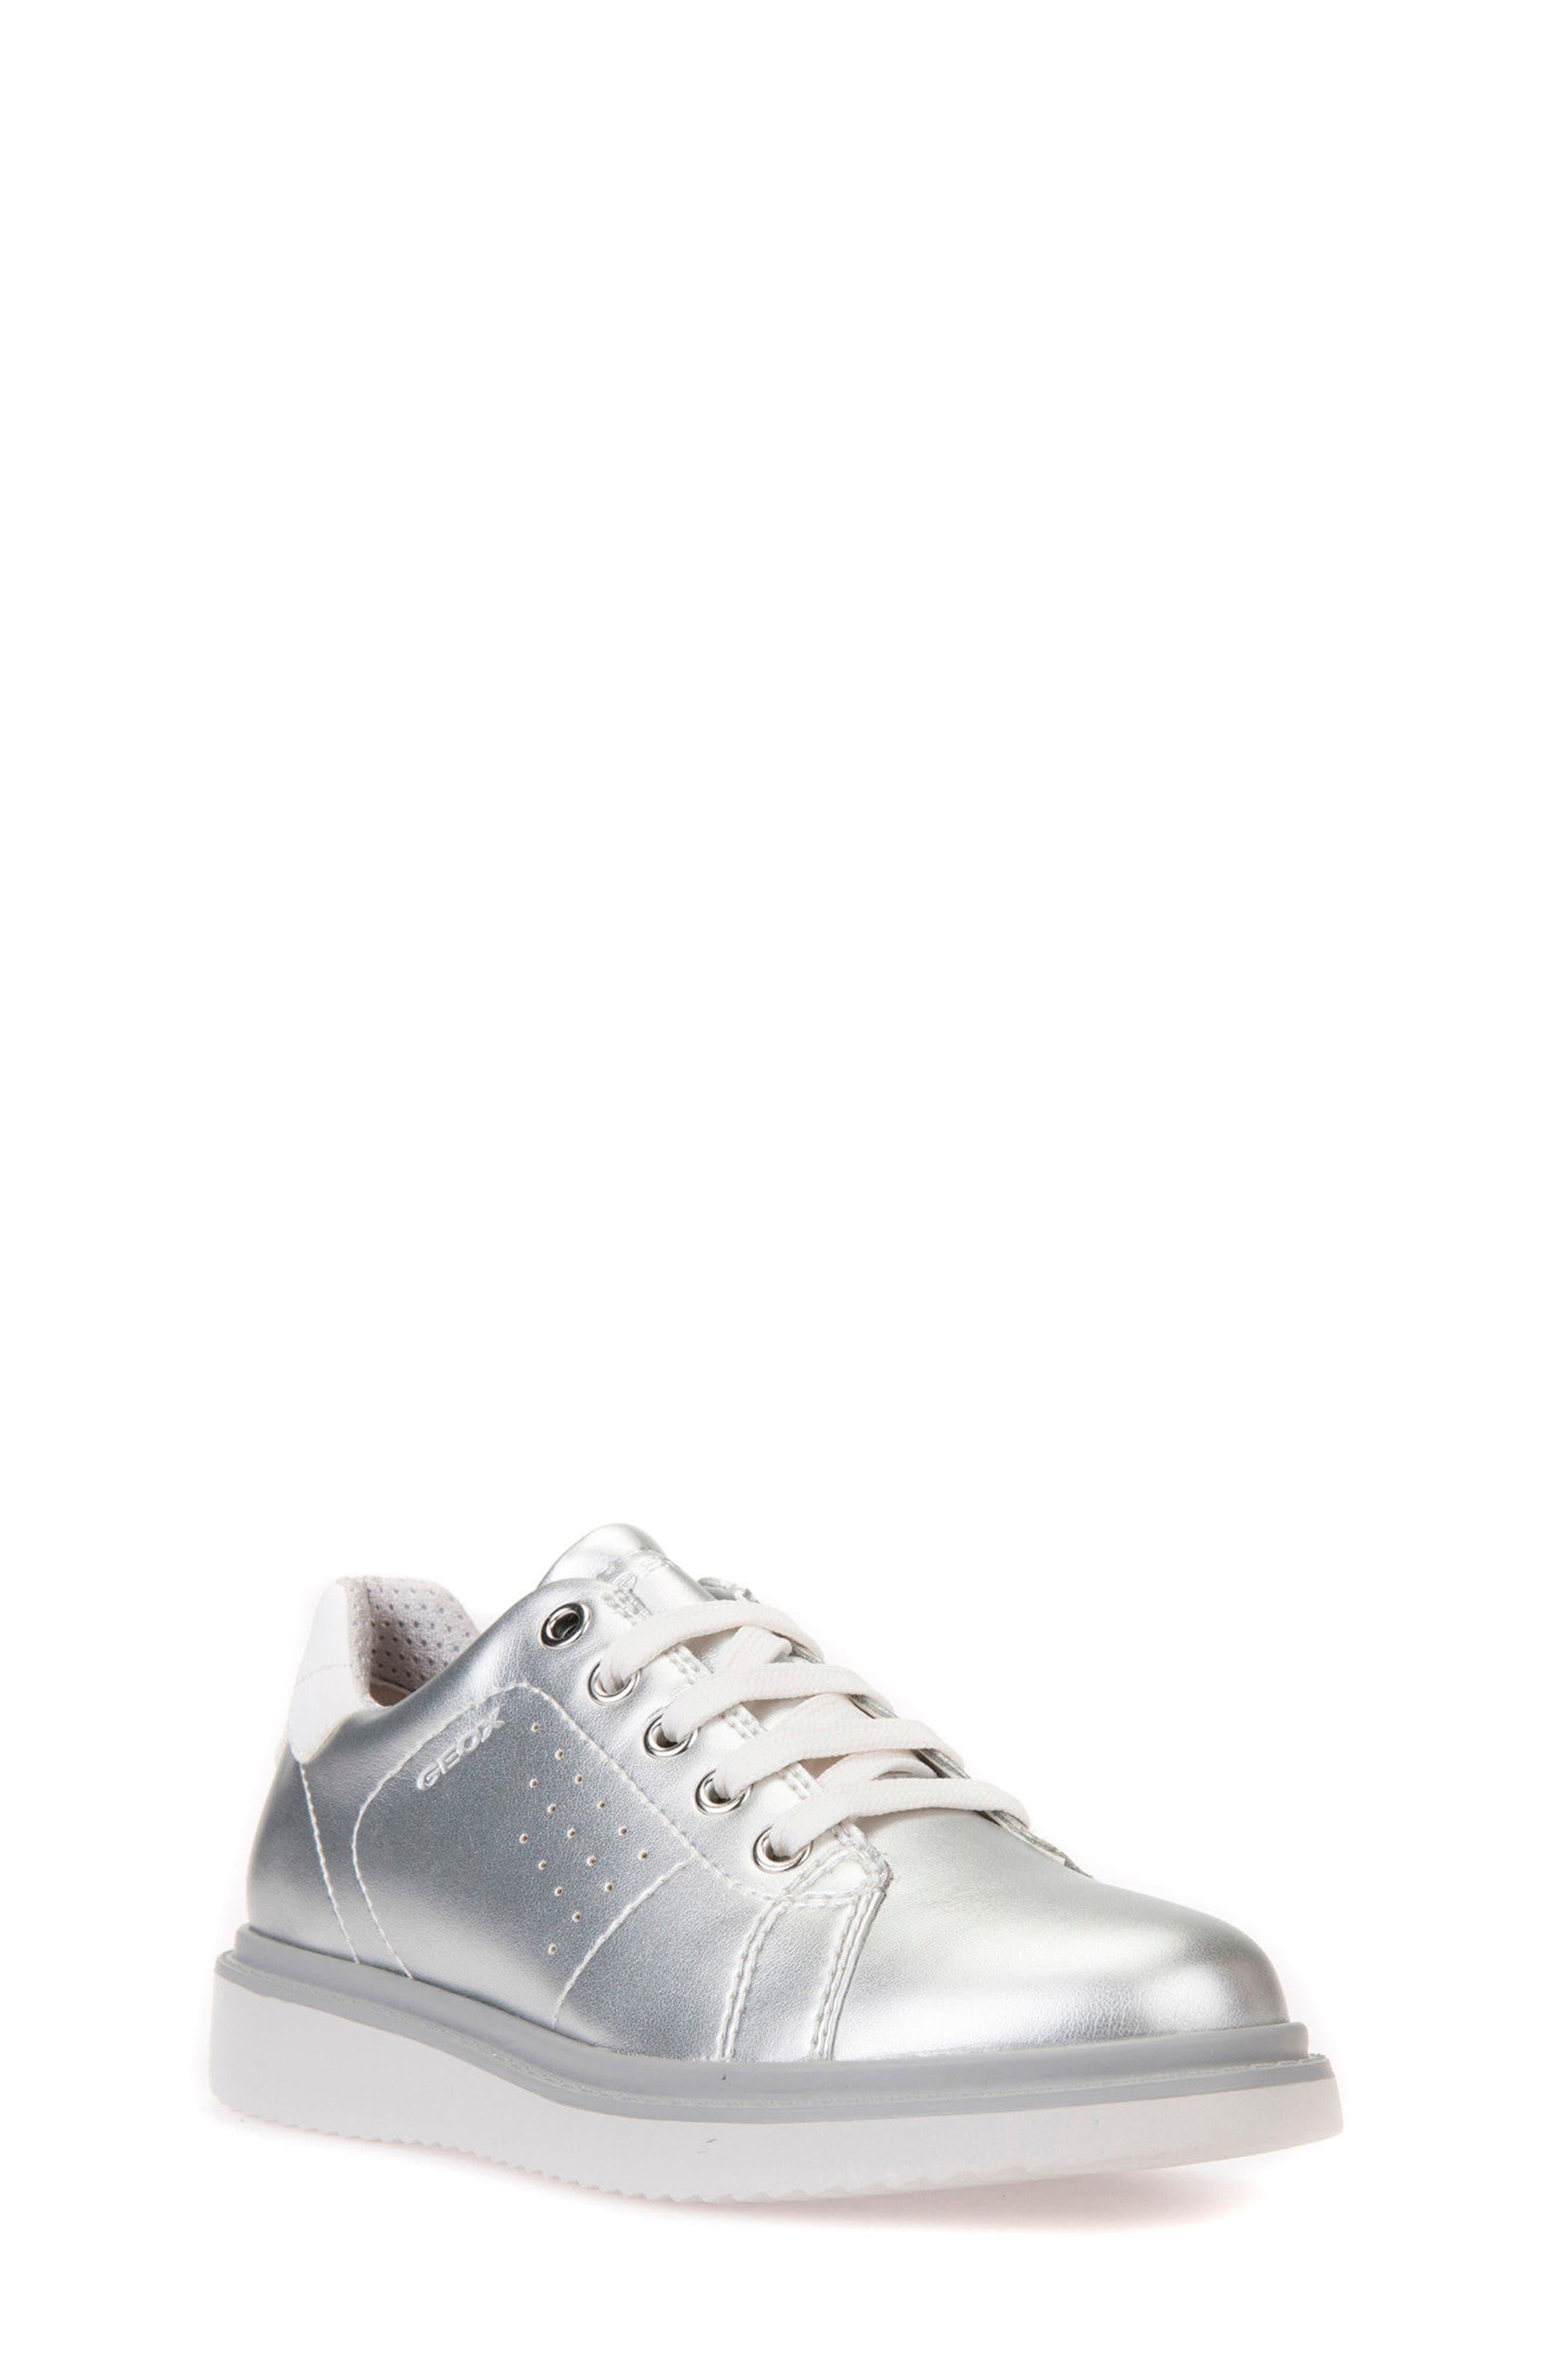 Main Image - Geox Thymar Low Top Sneaker (Toddler, Little Kid & Big Kid)